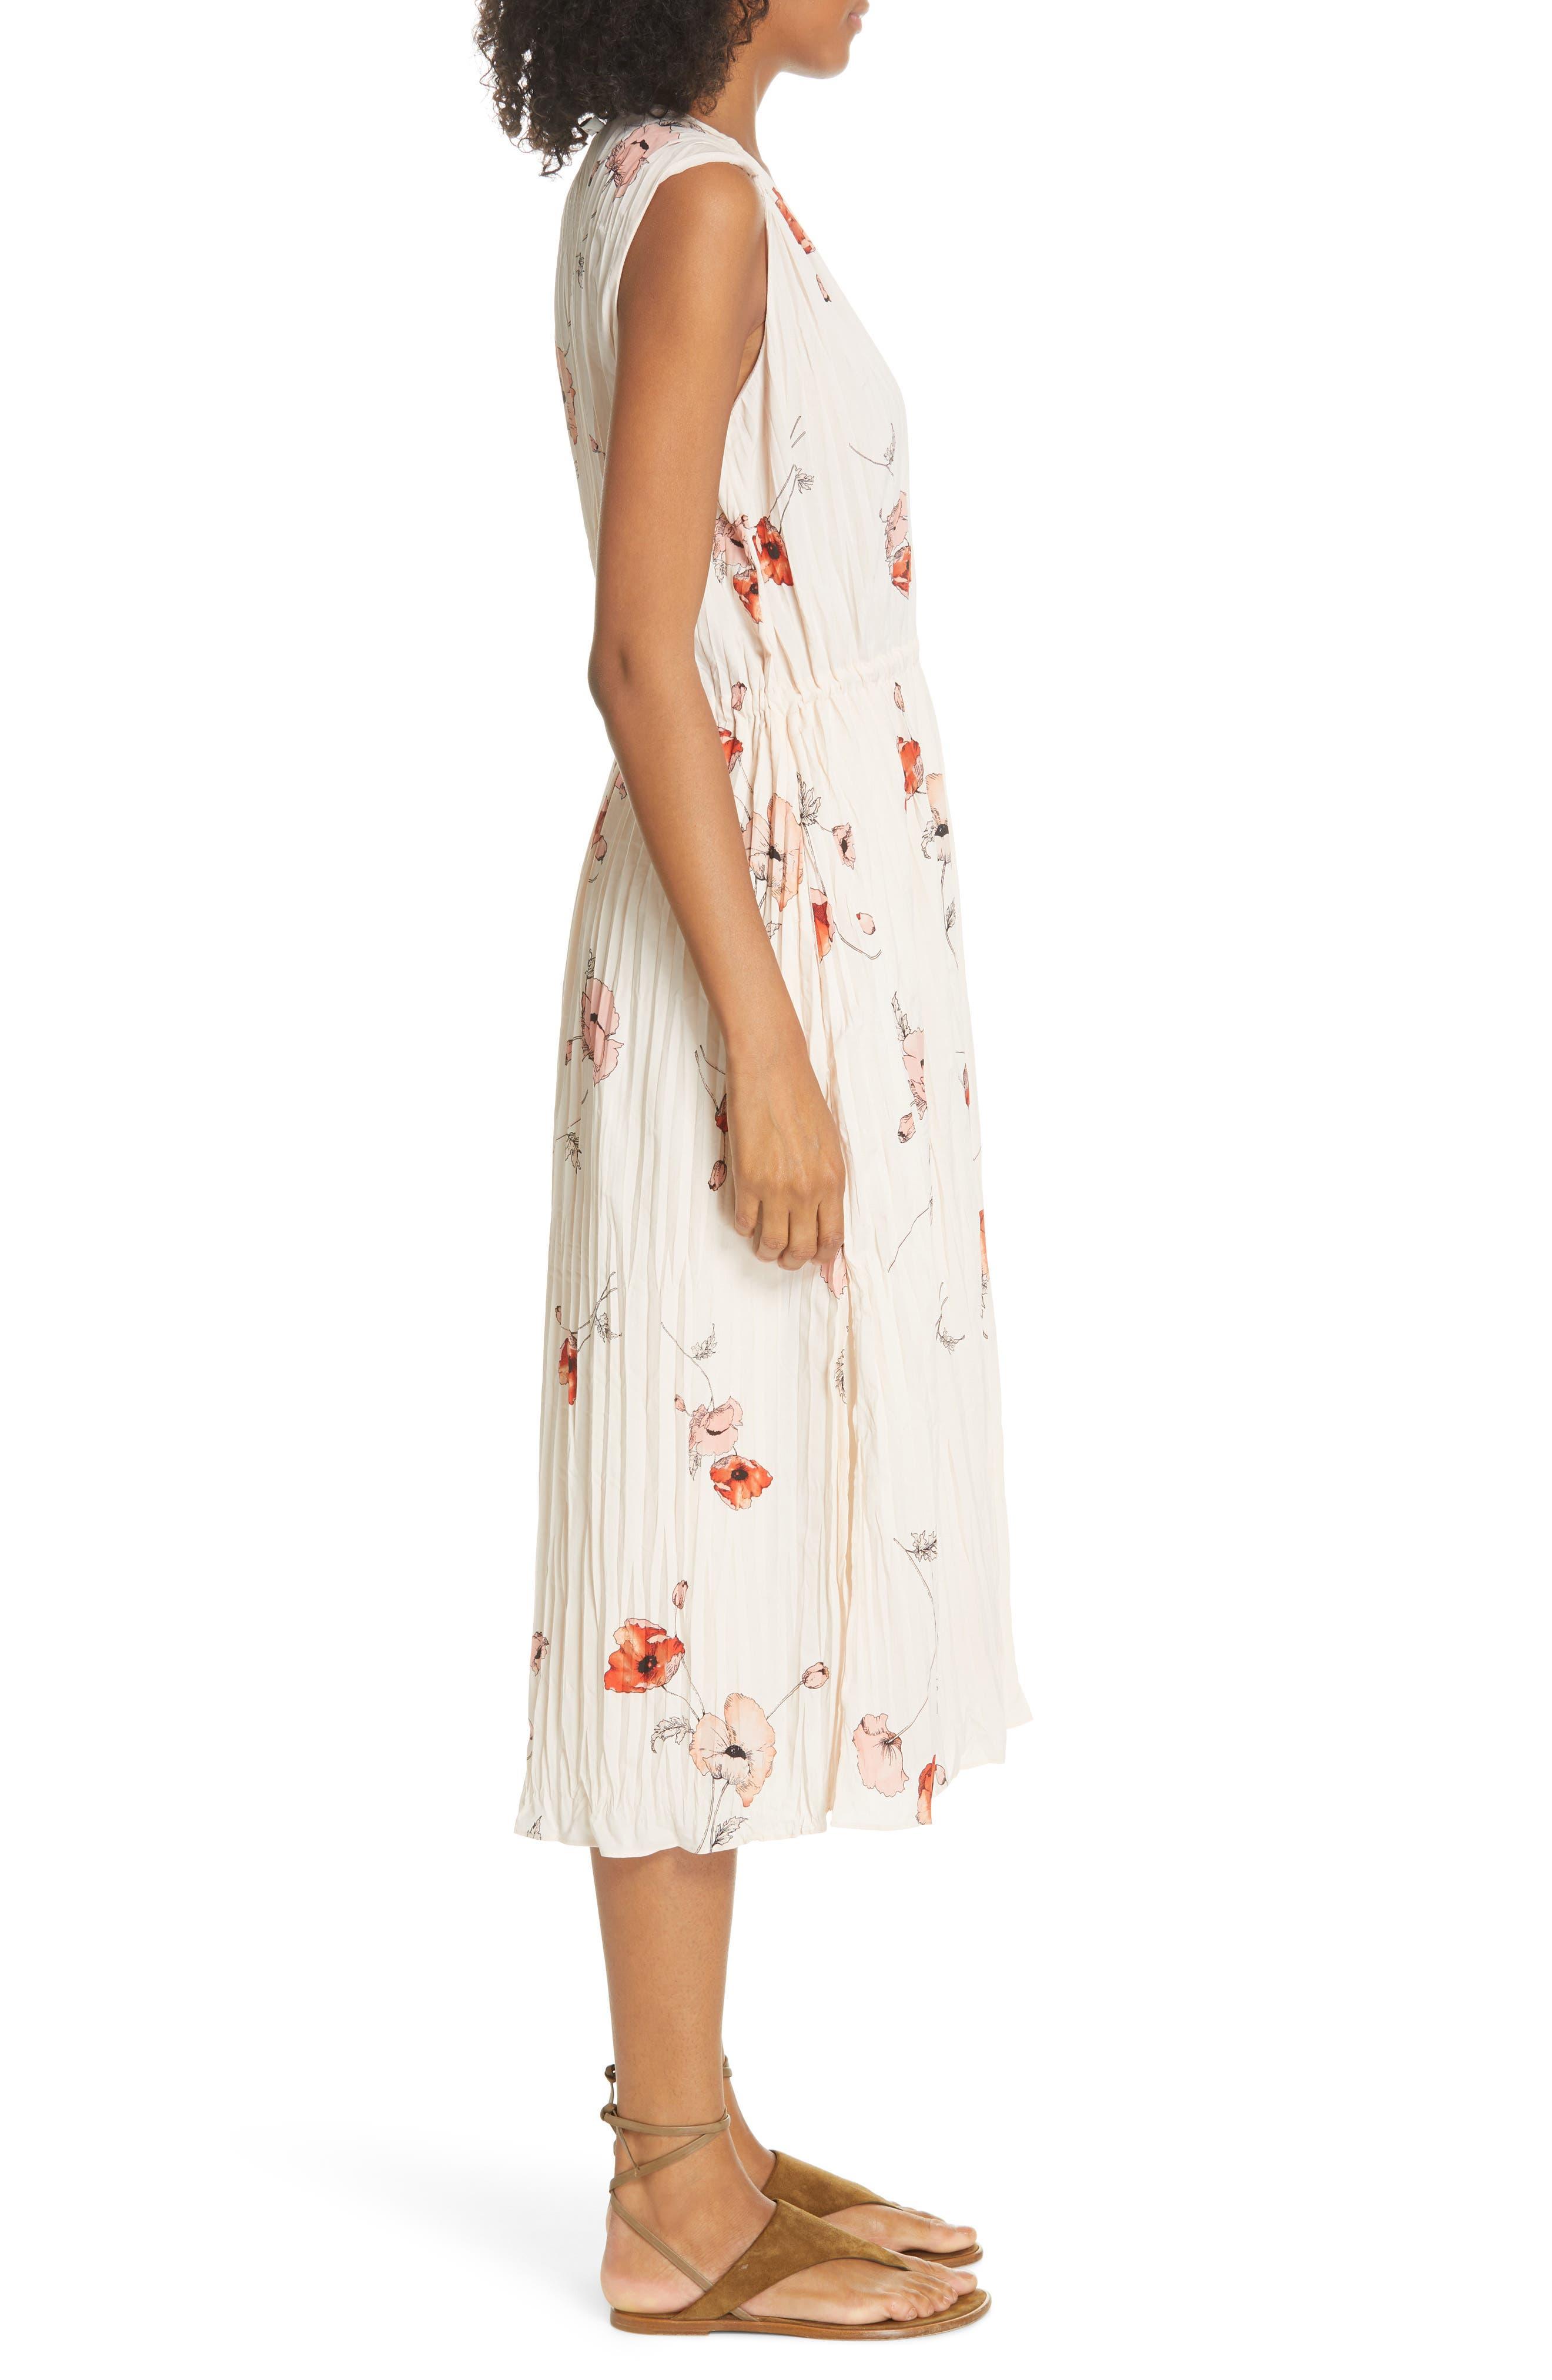 VINCE, Tossed Poppy Pleated Midi Dress, Alternate thumbnail 4, color, PALE BLUSH